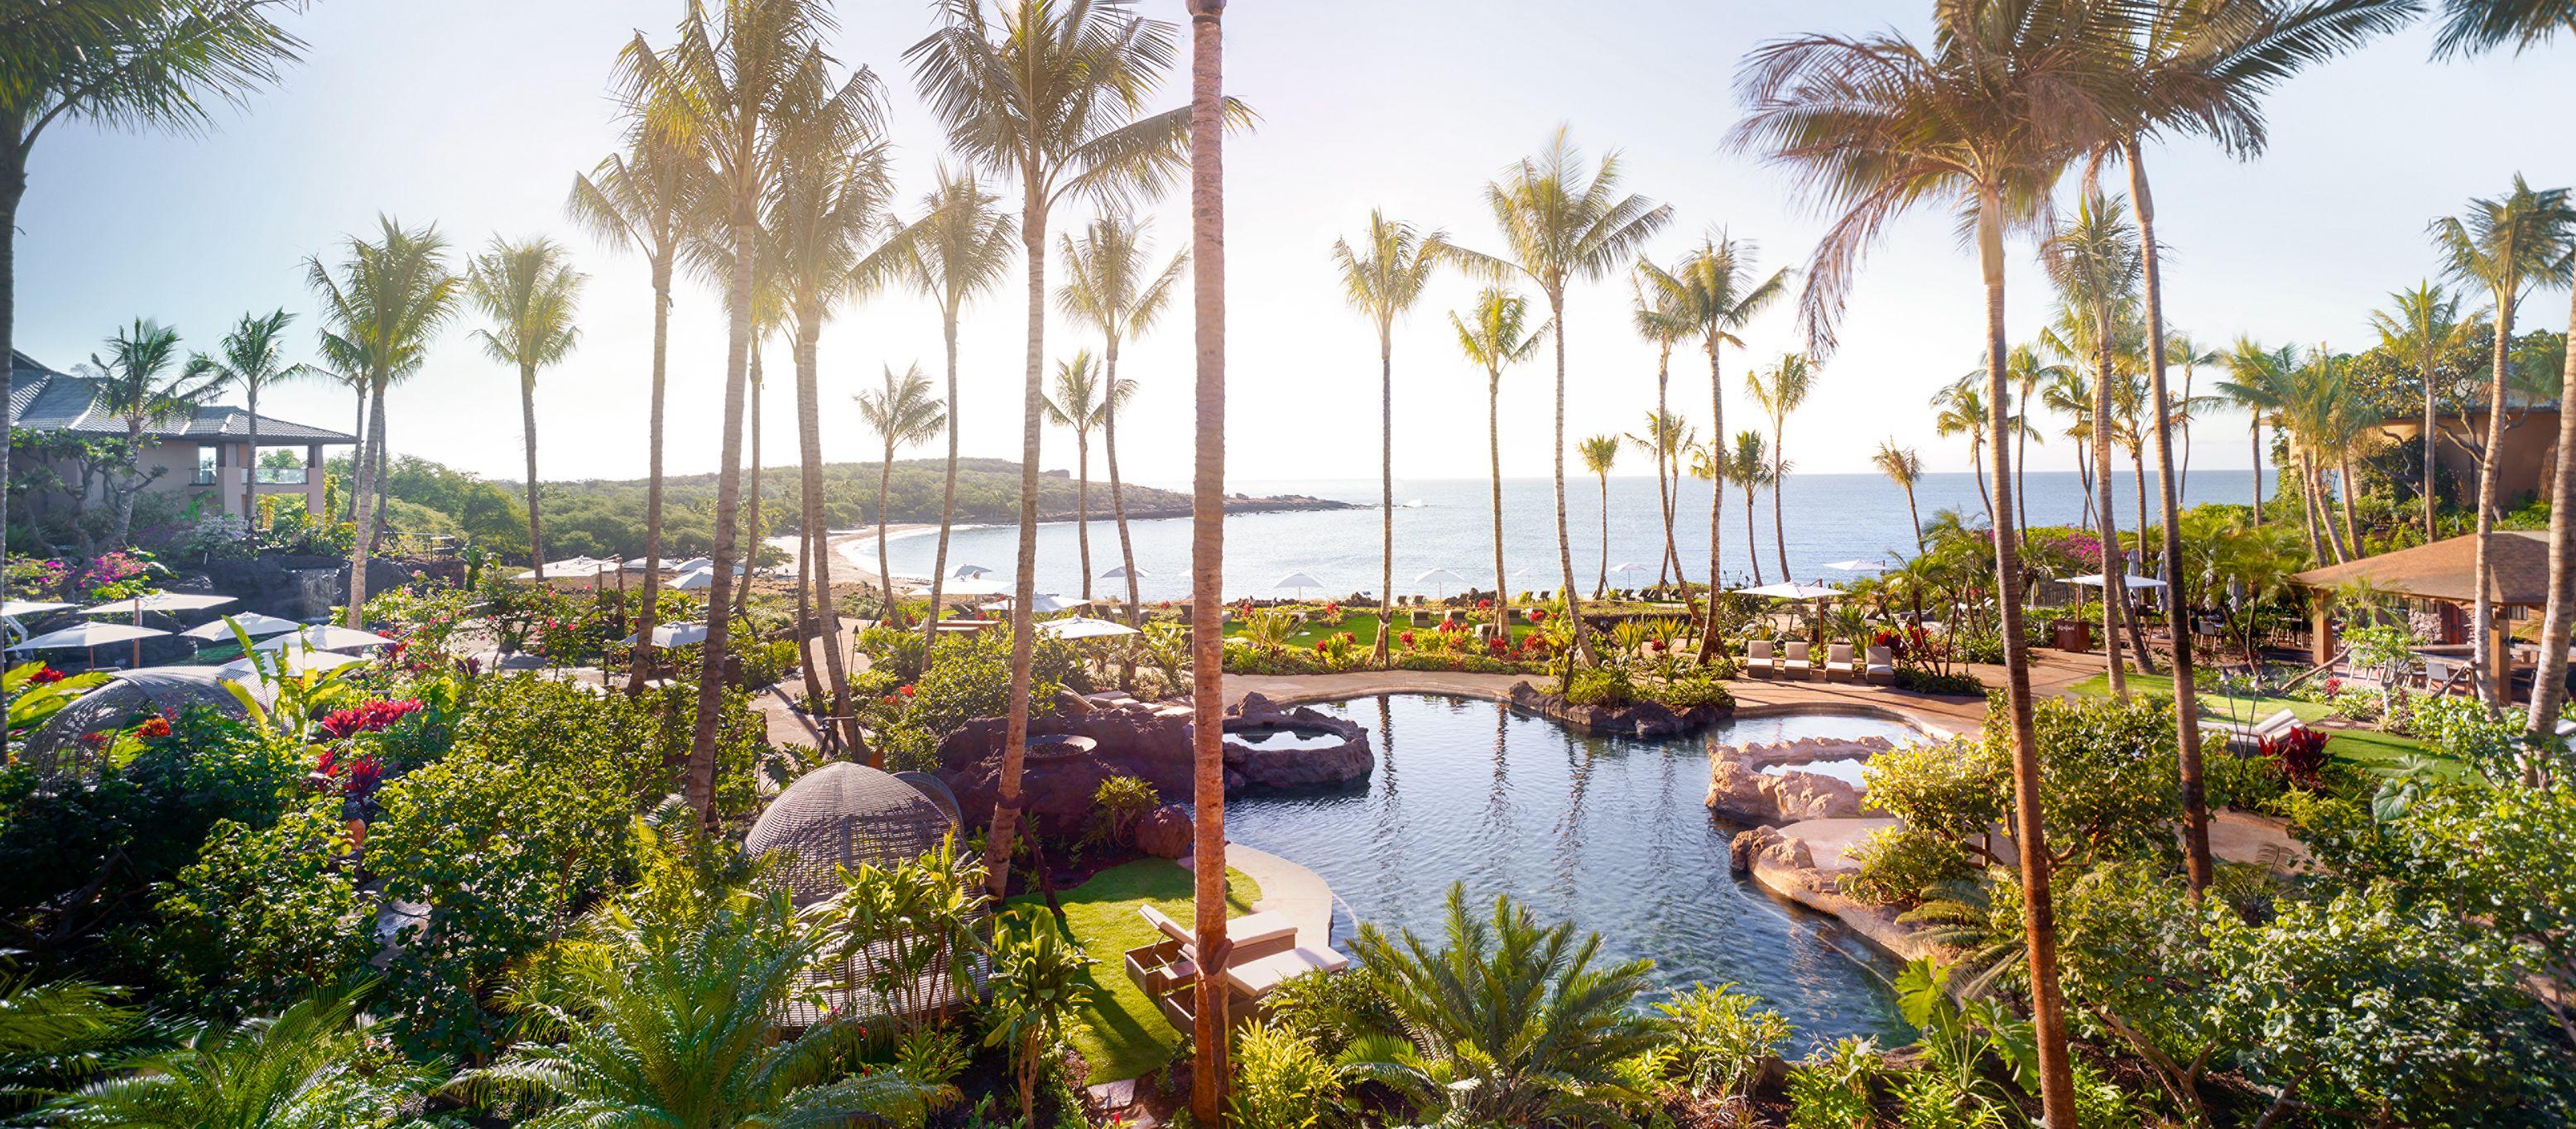 Poolbereich des Four Seasons auf Lanai, Hawaii